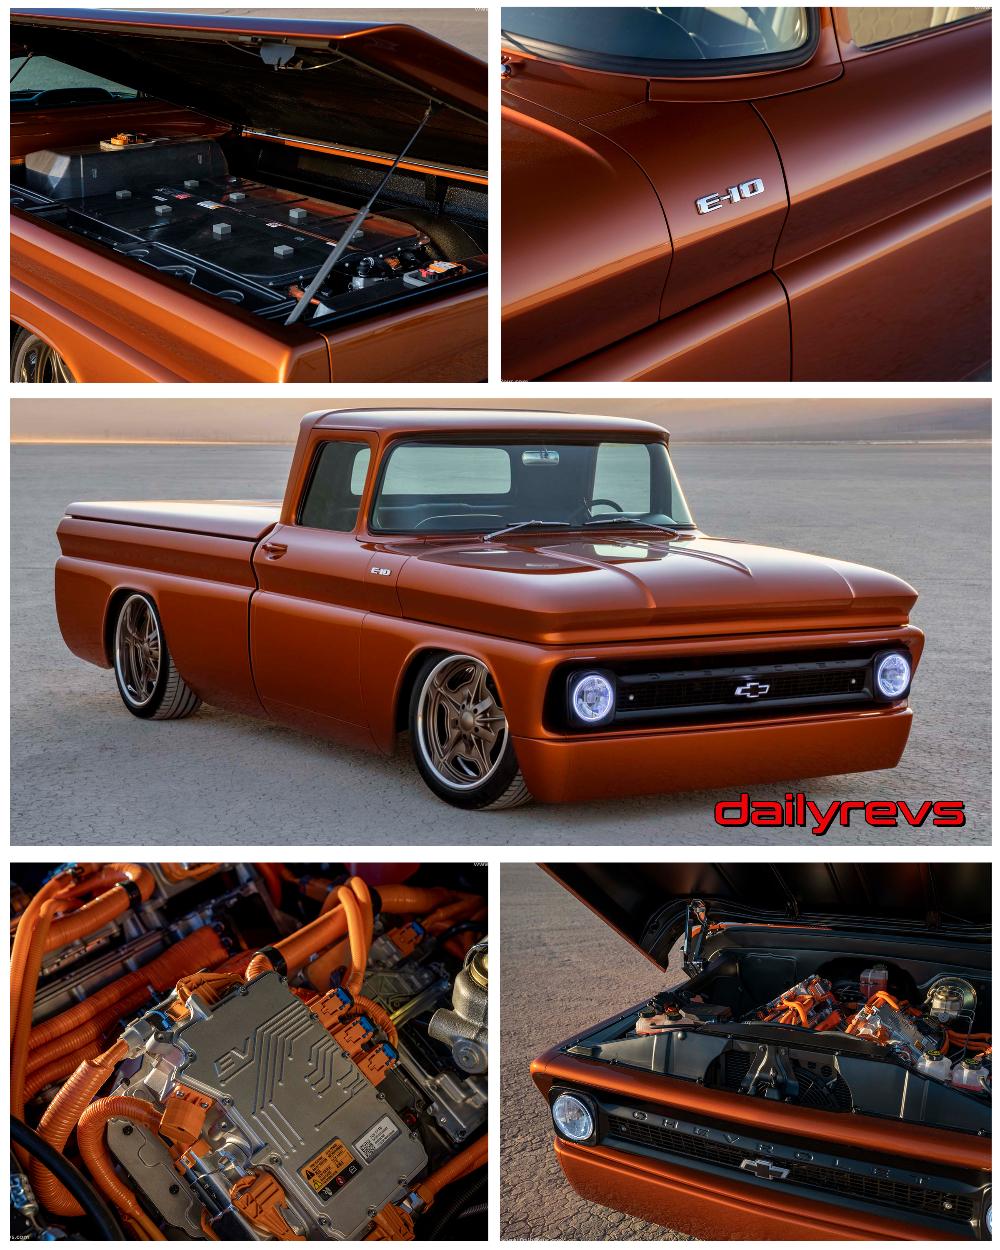 2020 Chevrolet E10 Concept Chevrolet, Crate motors